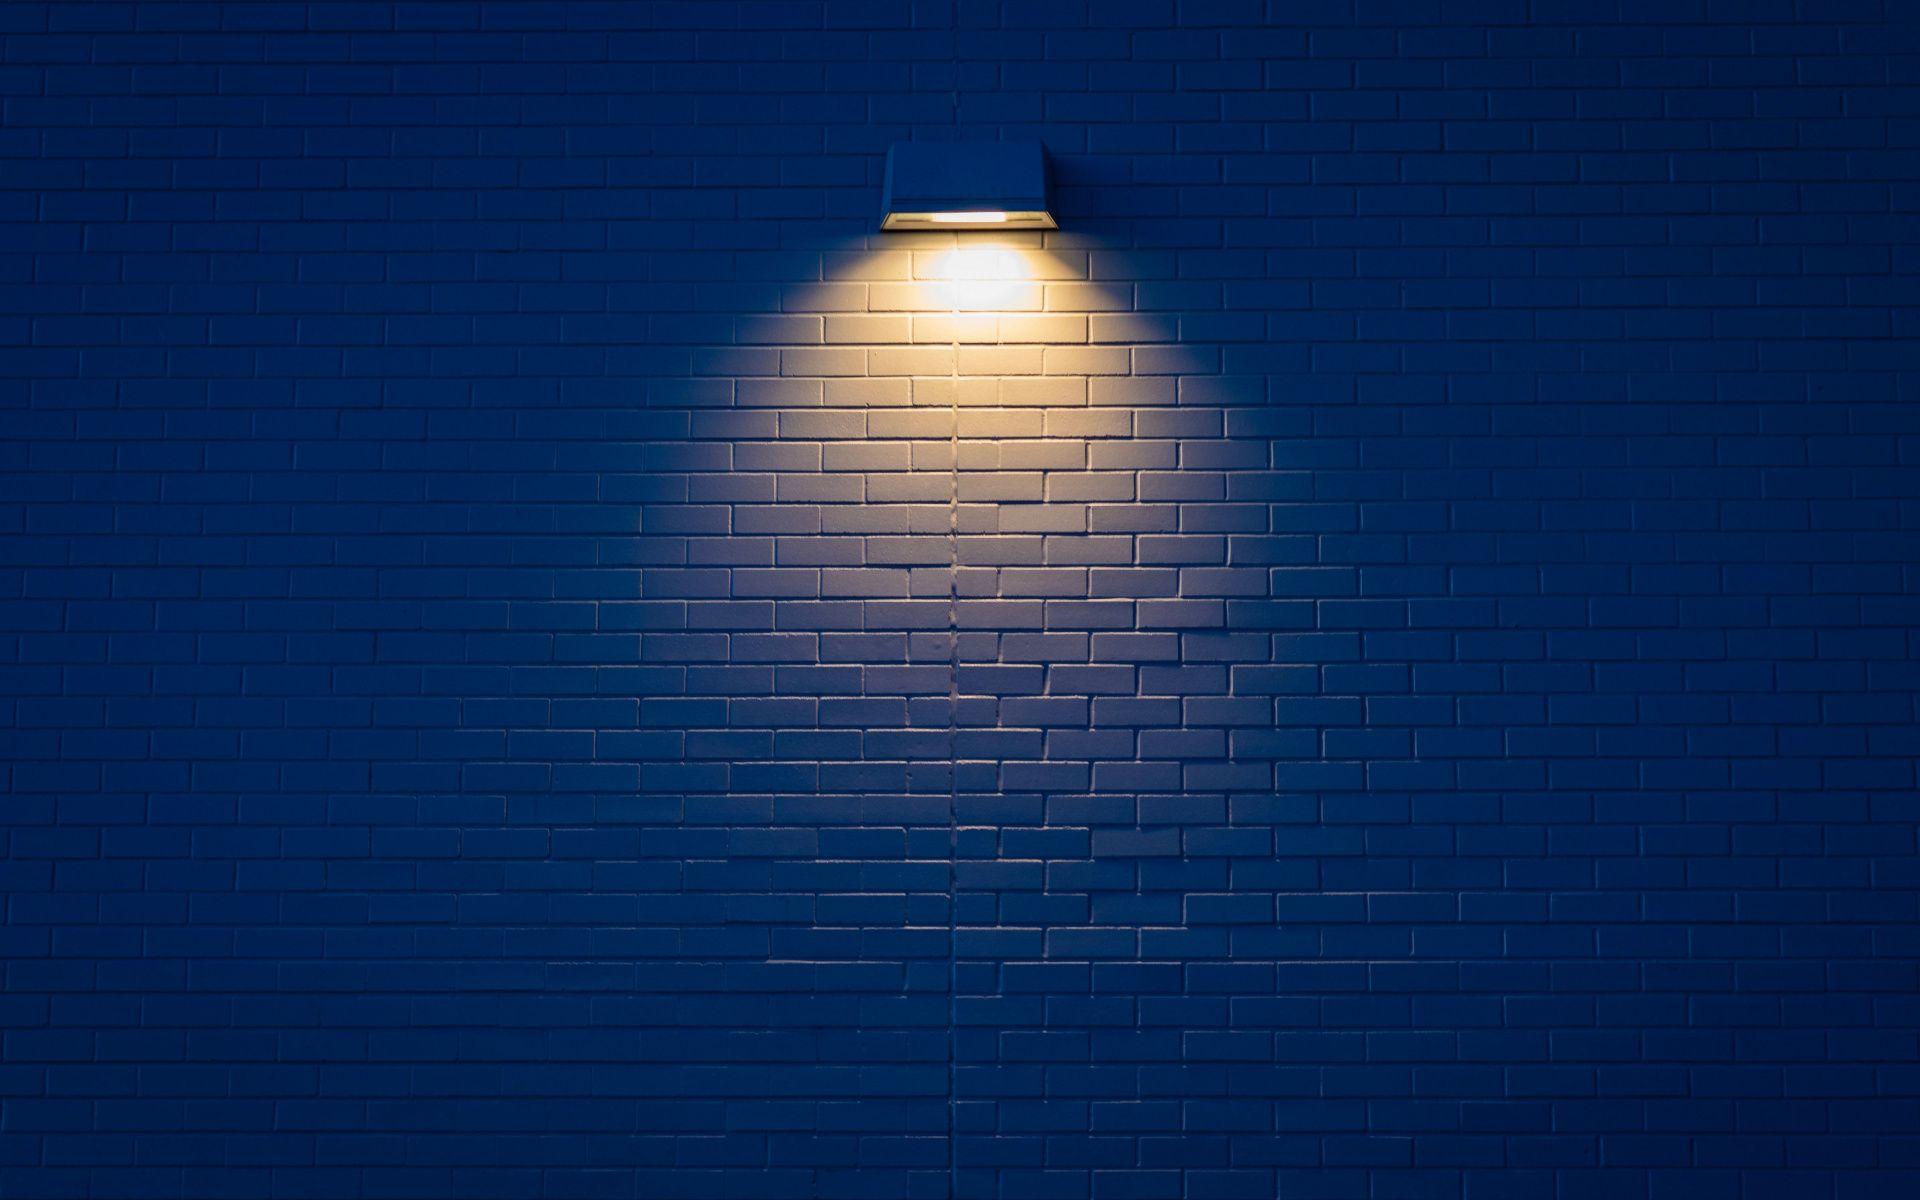 Download 1920x1200 Wallpaper White Wall Yellow Lamp Minimal Decoration Widescreen 16 10 Widescreen 1920x1200 Hd Image Backg In 2020 Yellow Lamp White Walls Lamp